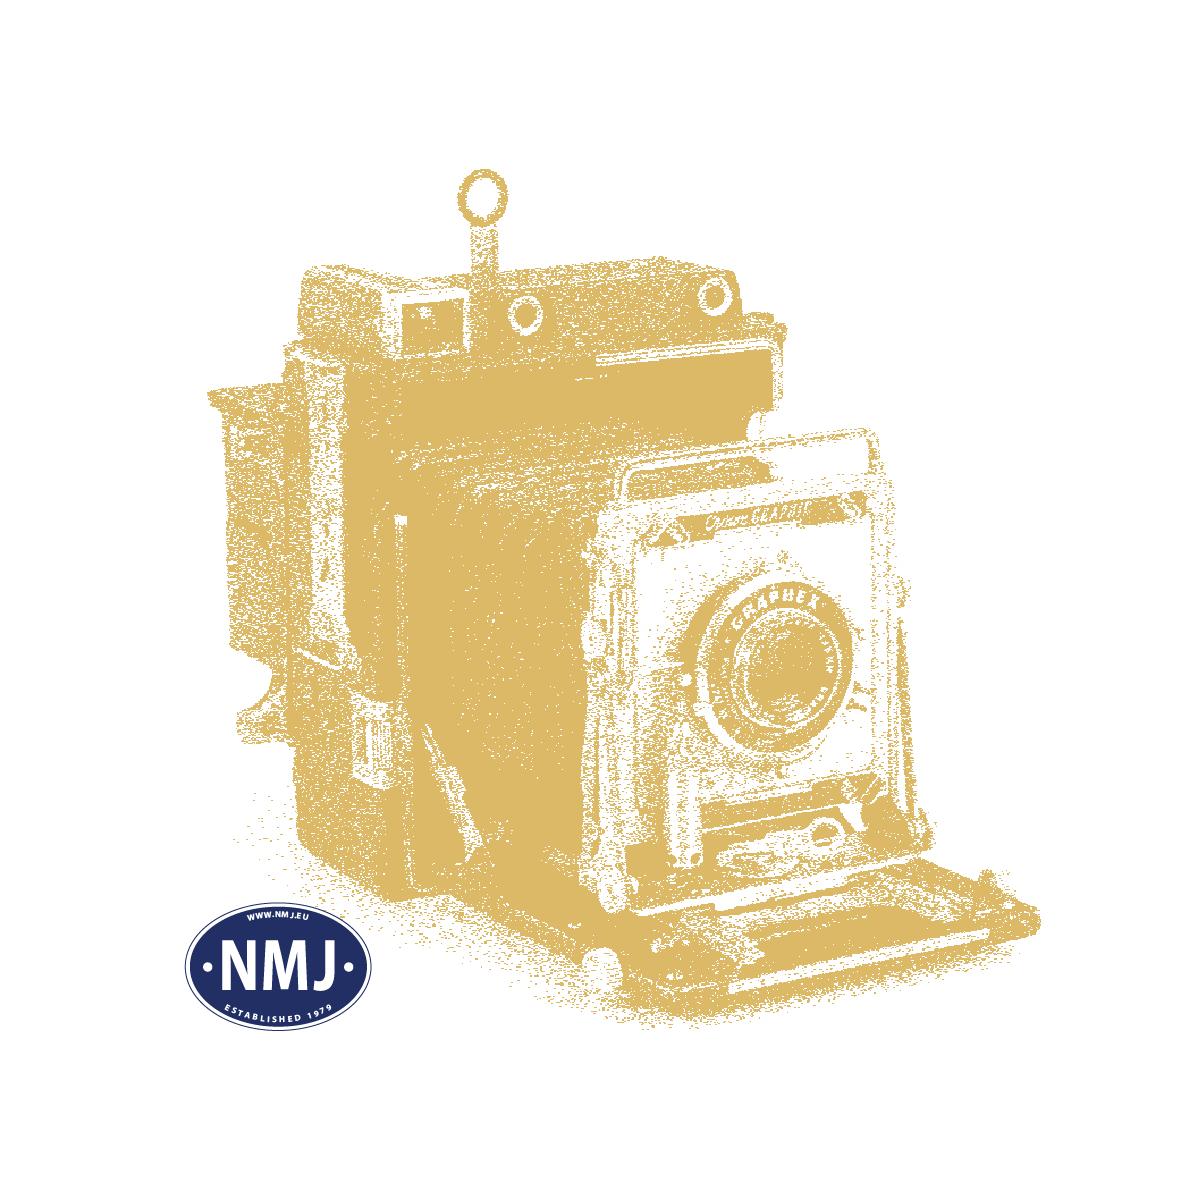 NMJT503.109 - NMJ Topline NSB Gbkl 118 4215-5